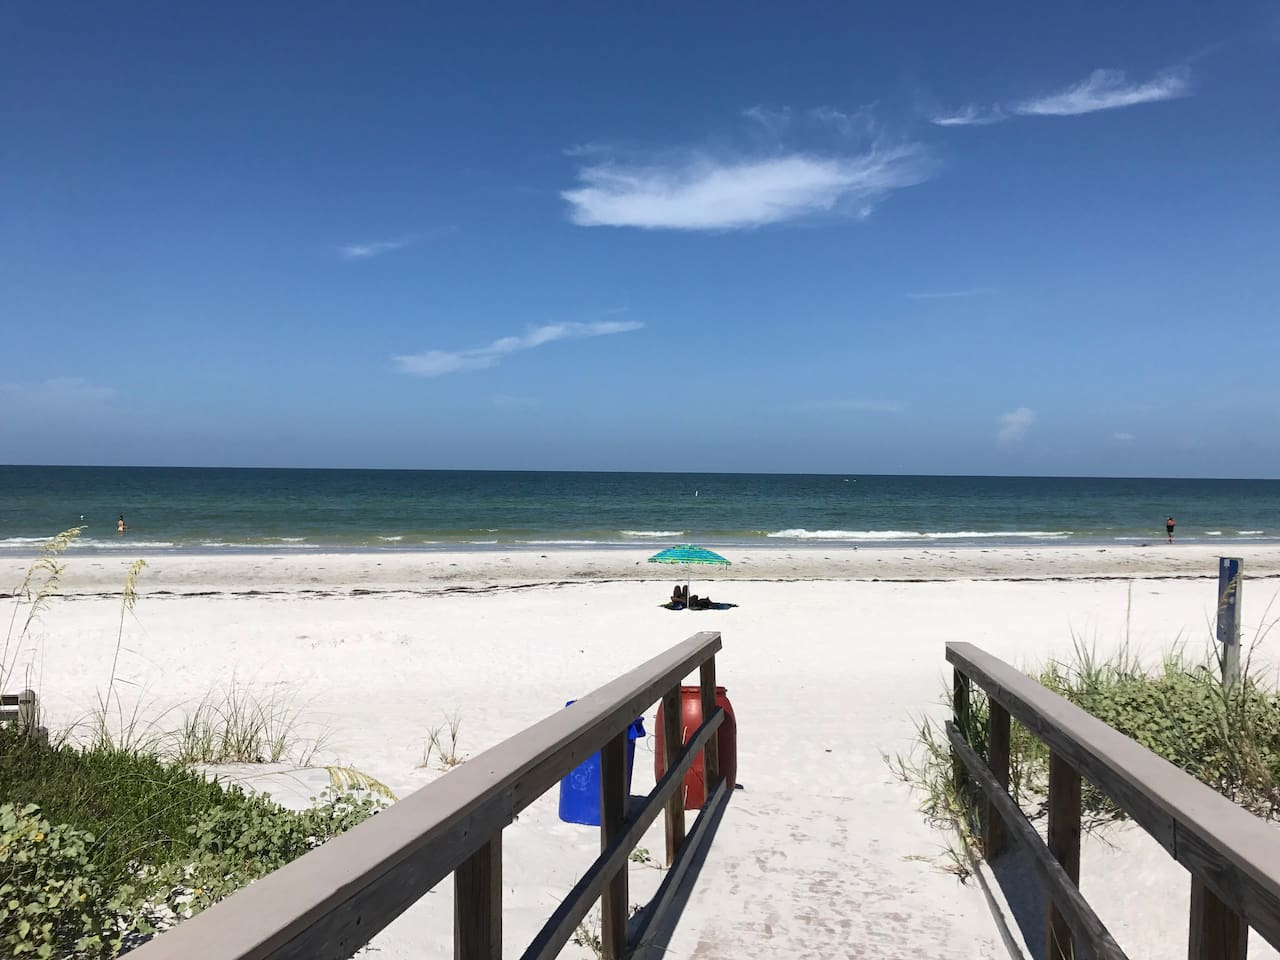 Beach access is a boardwalk